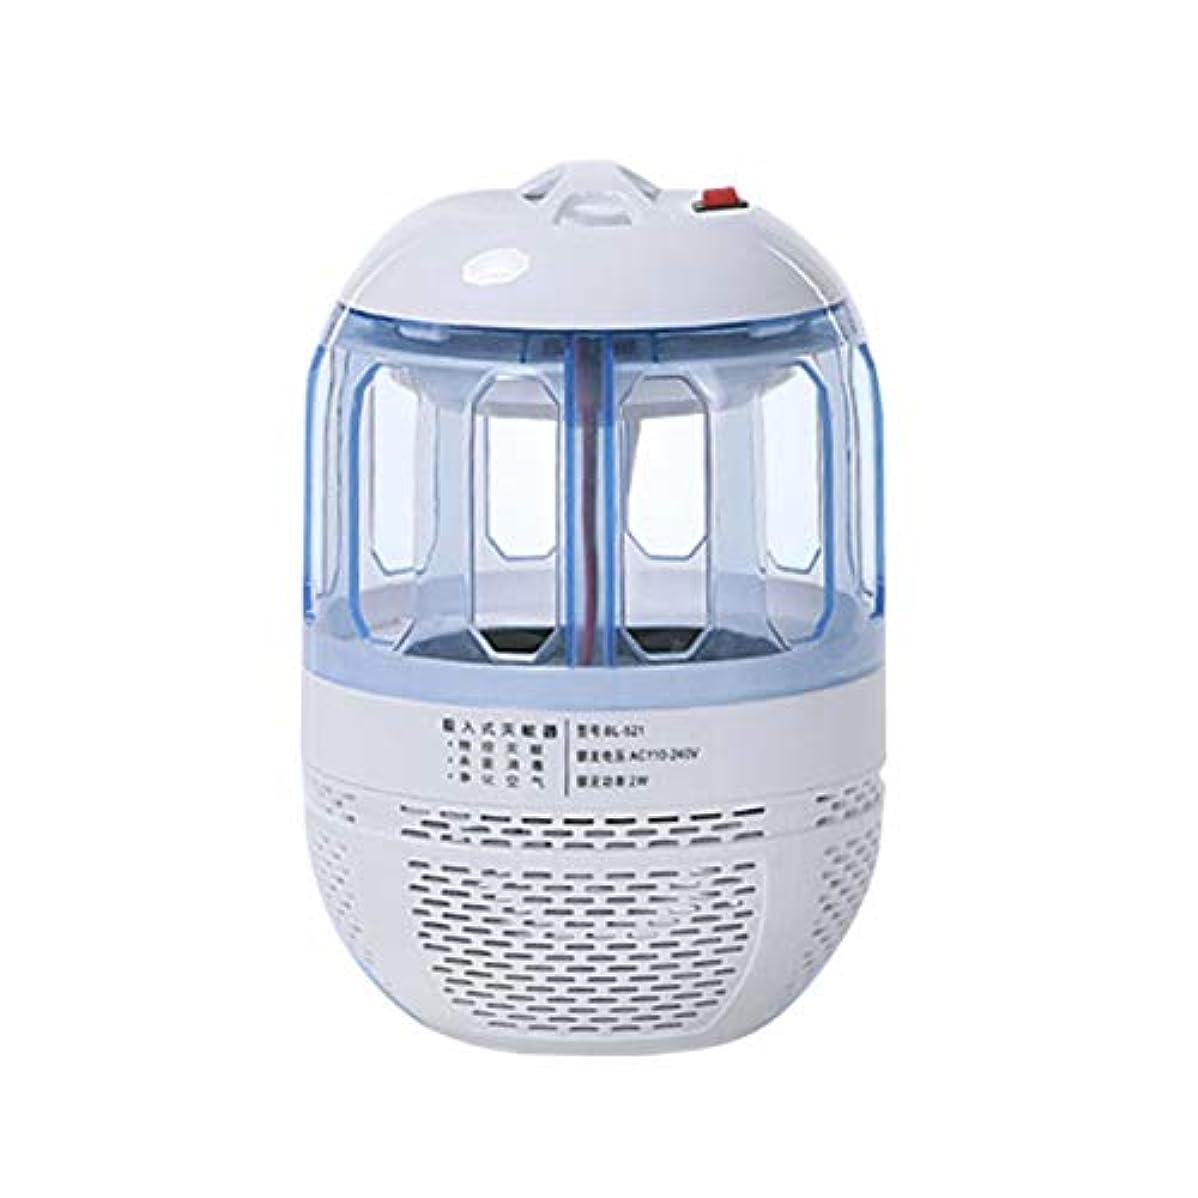 Saikogoods 超静音電子モスキートキラー光触媒ライトバグ昆虫キャッチャーUSB電源非放射線モスキートトラップ 白